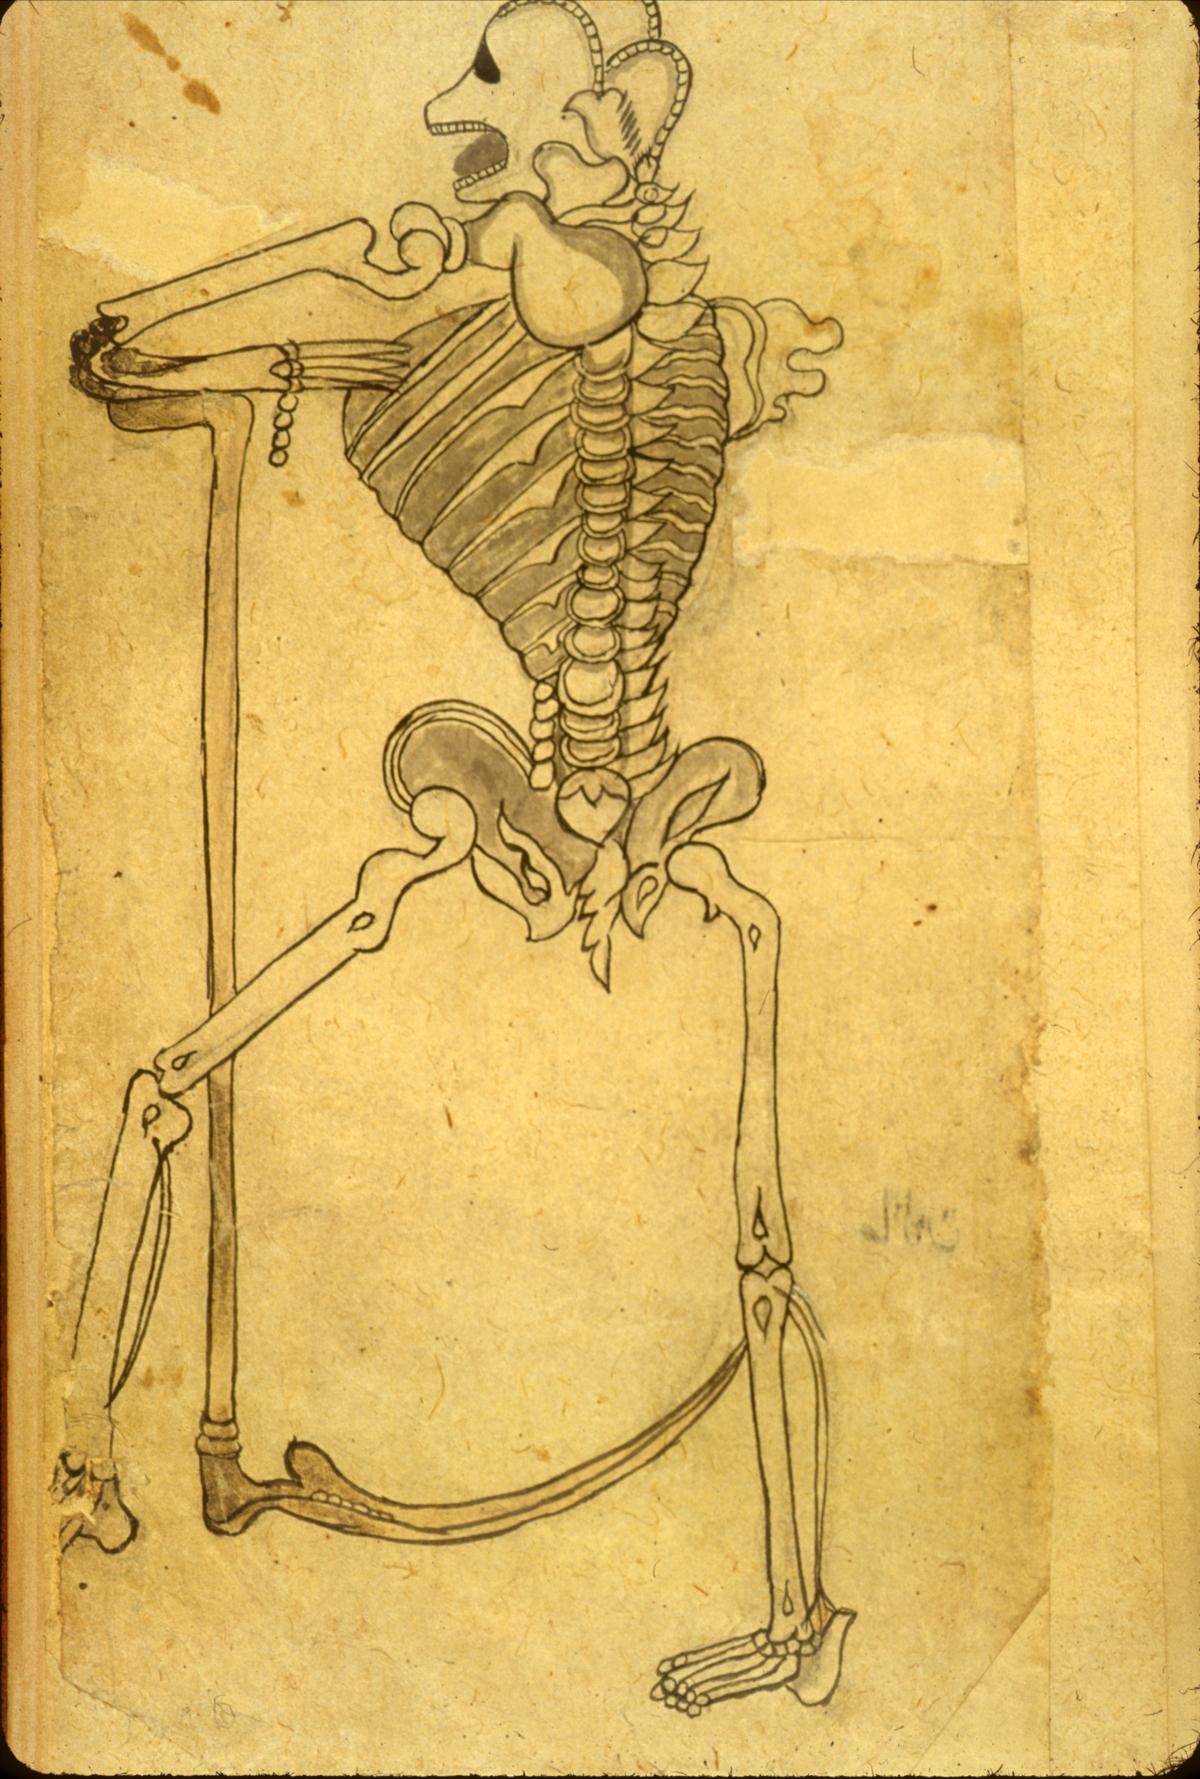 Islamic Medical Manuscripts, Medical Monographs - Gallery